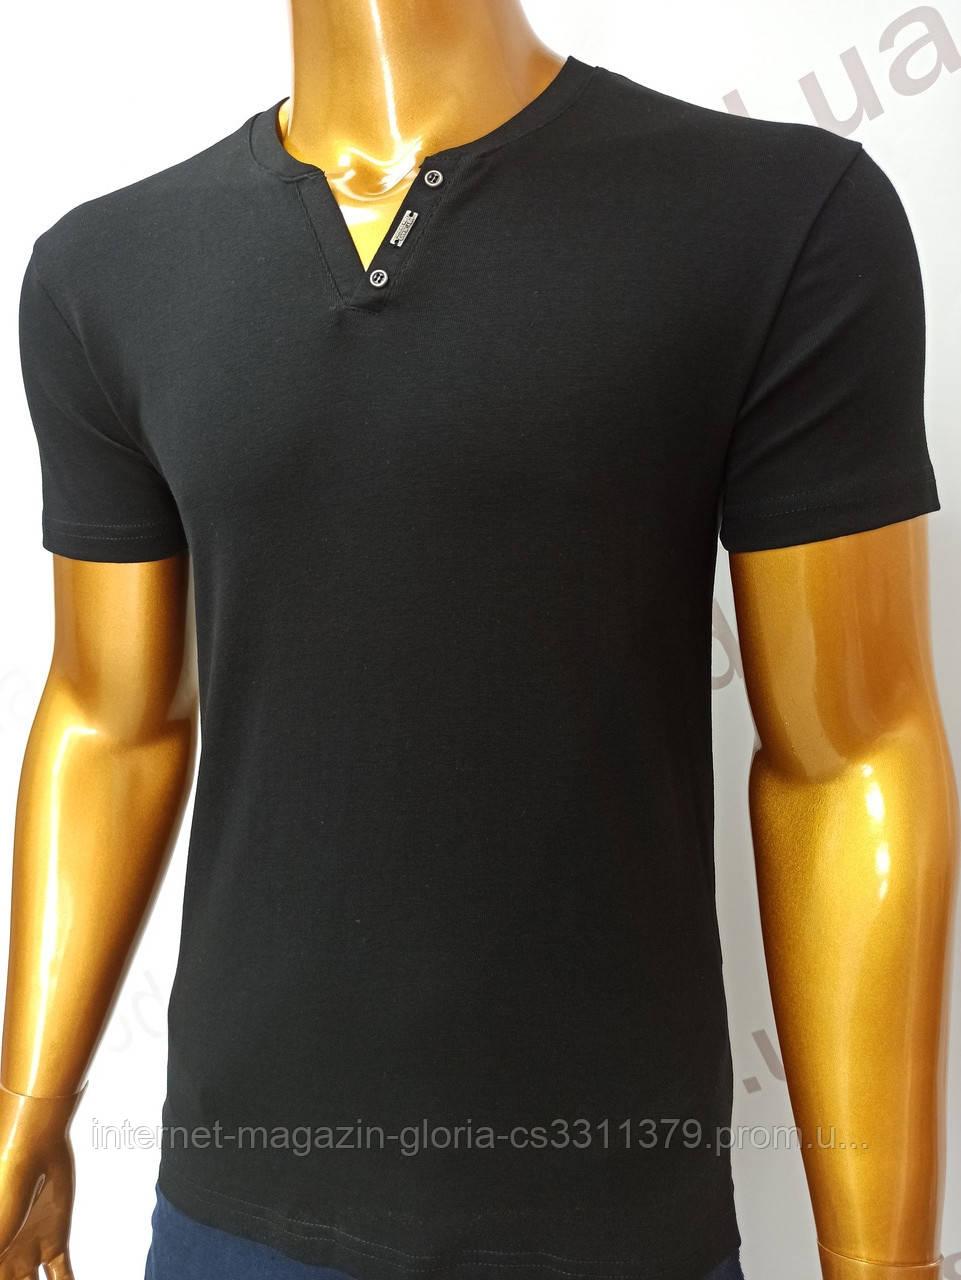 Мужская футболка MSY. 23214-8196(чёрный). Размеры: M,L,XL,XXL.